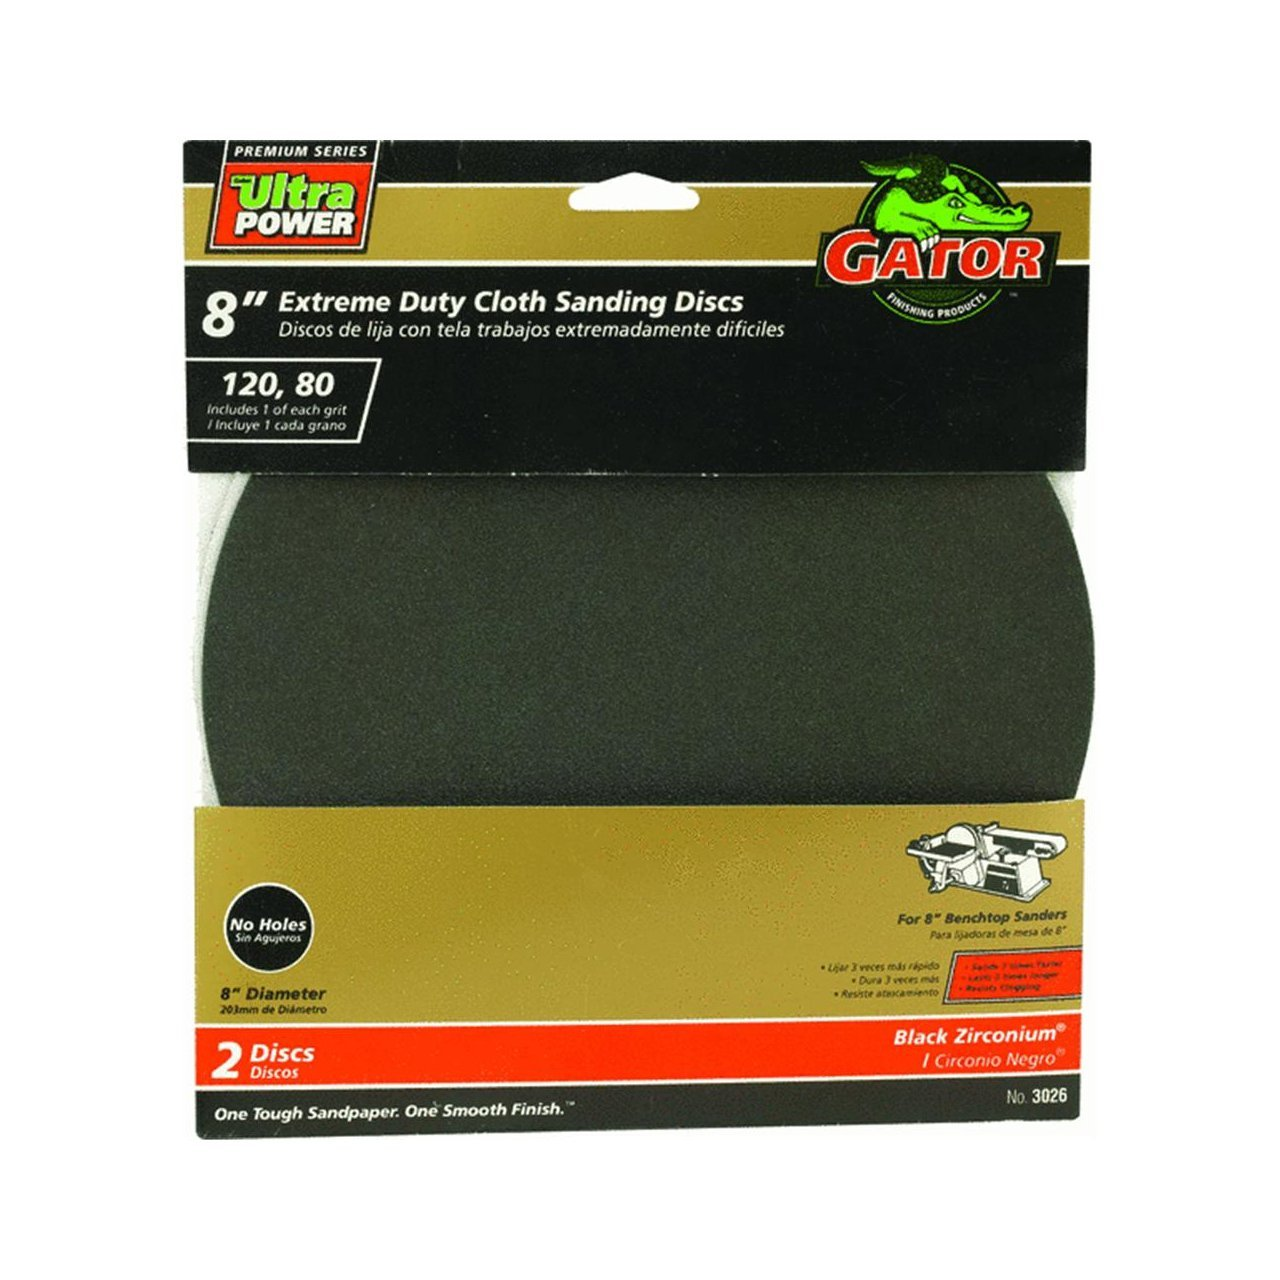 8 Extreme Duty Cloth Sanding Disc